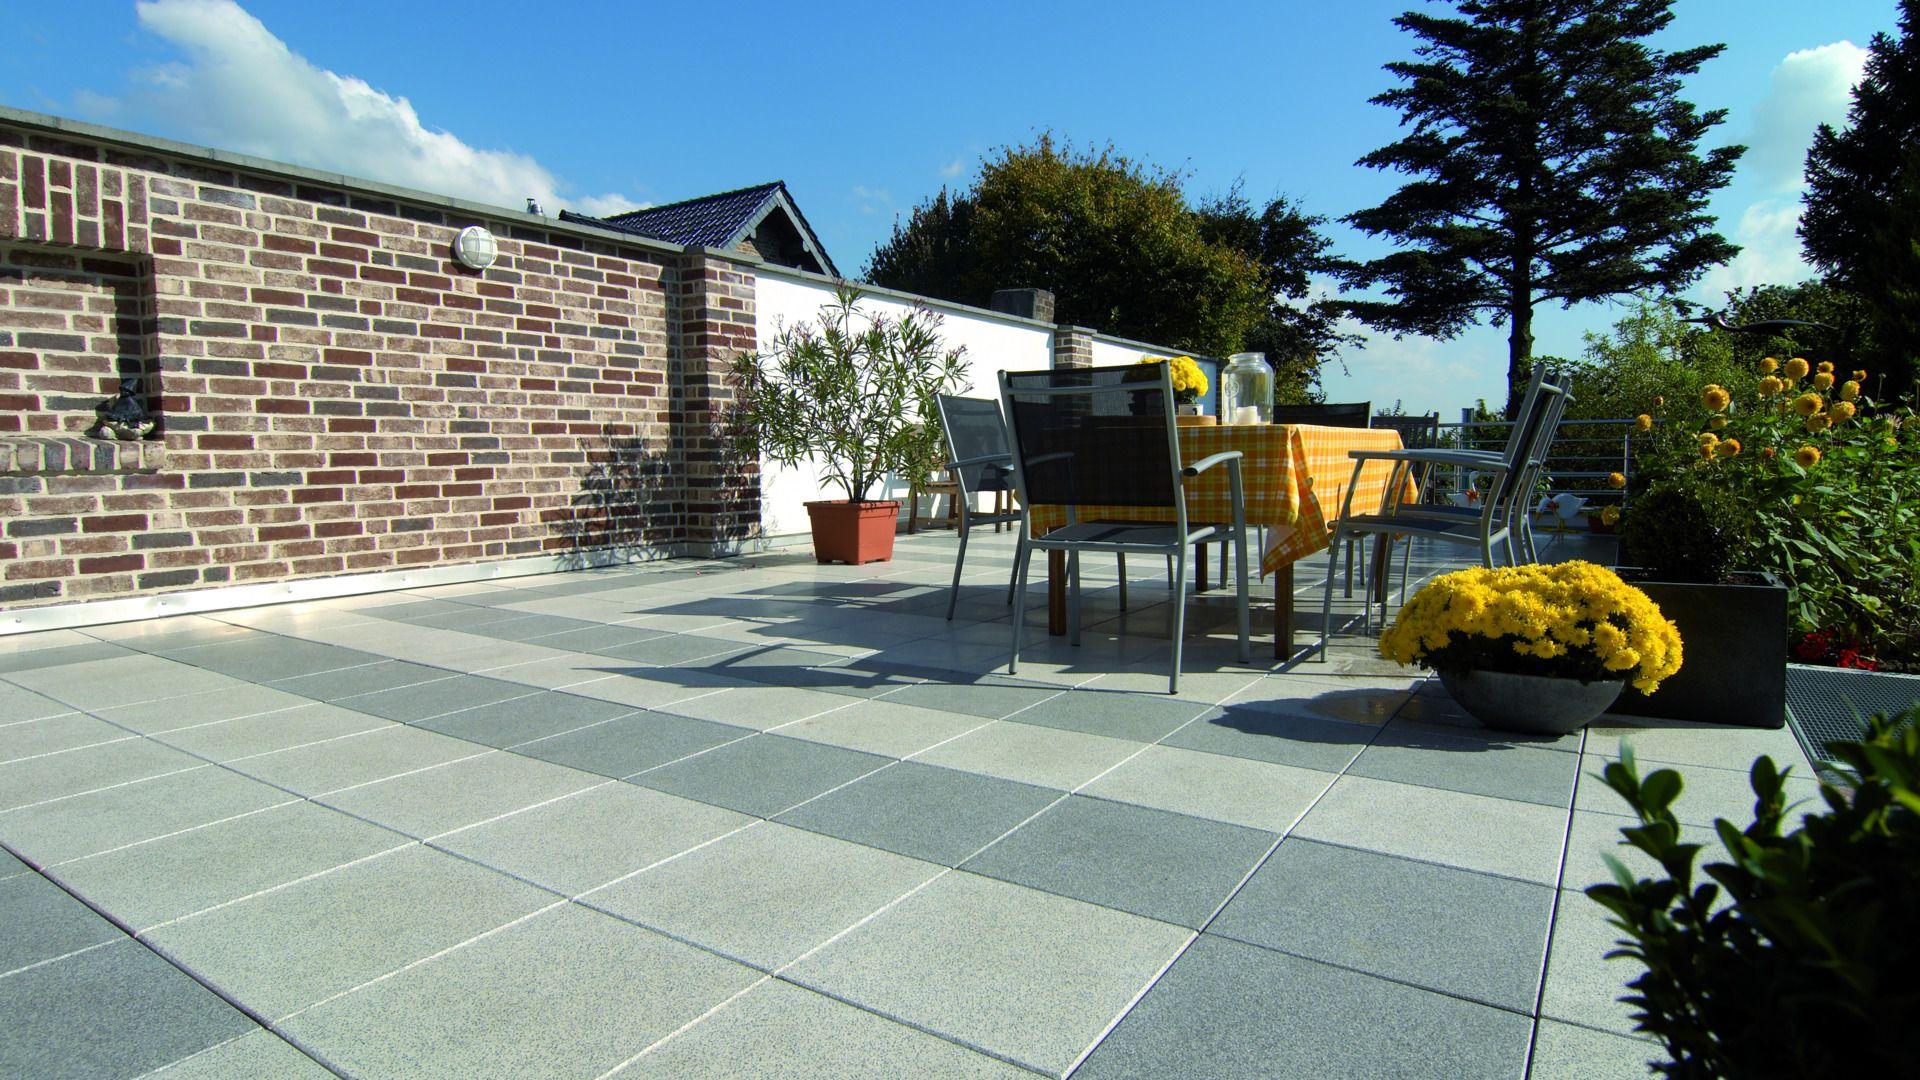 Terrassenplatten Aisonlinede - Terrassenplatten weiß 40x40